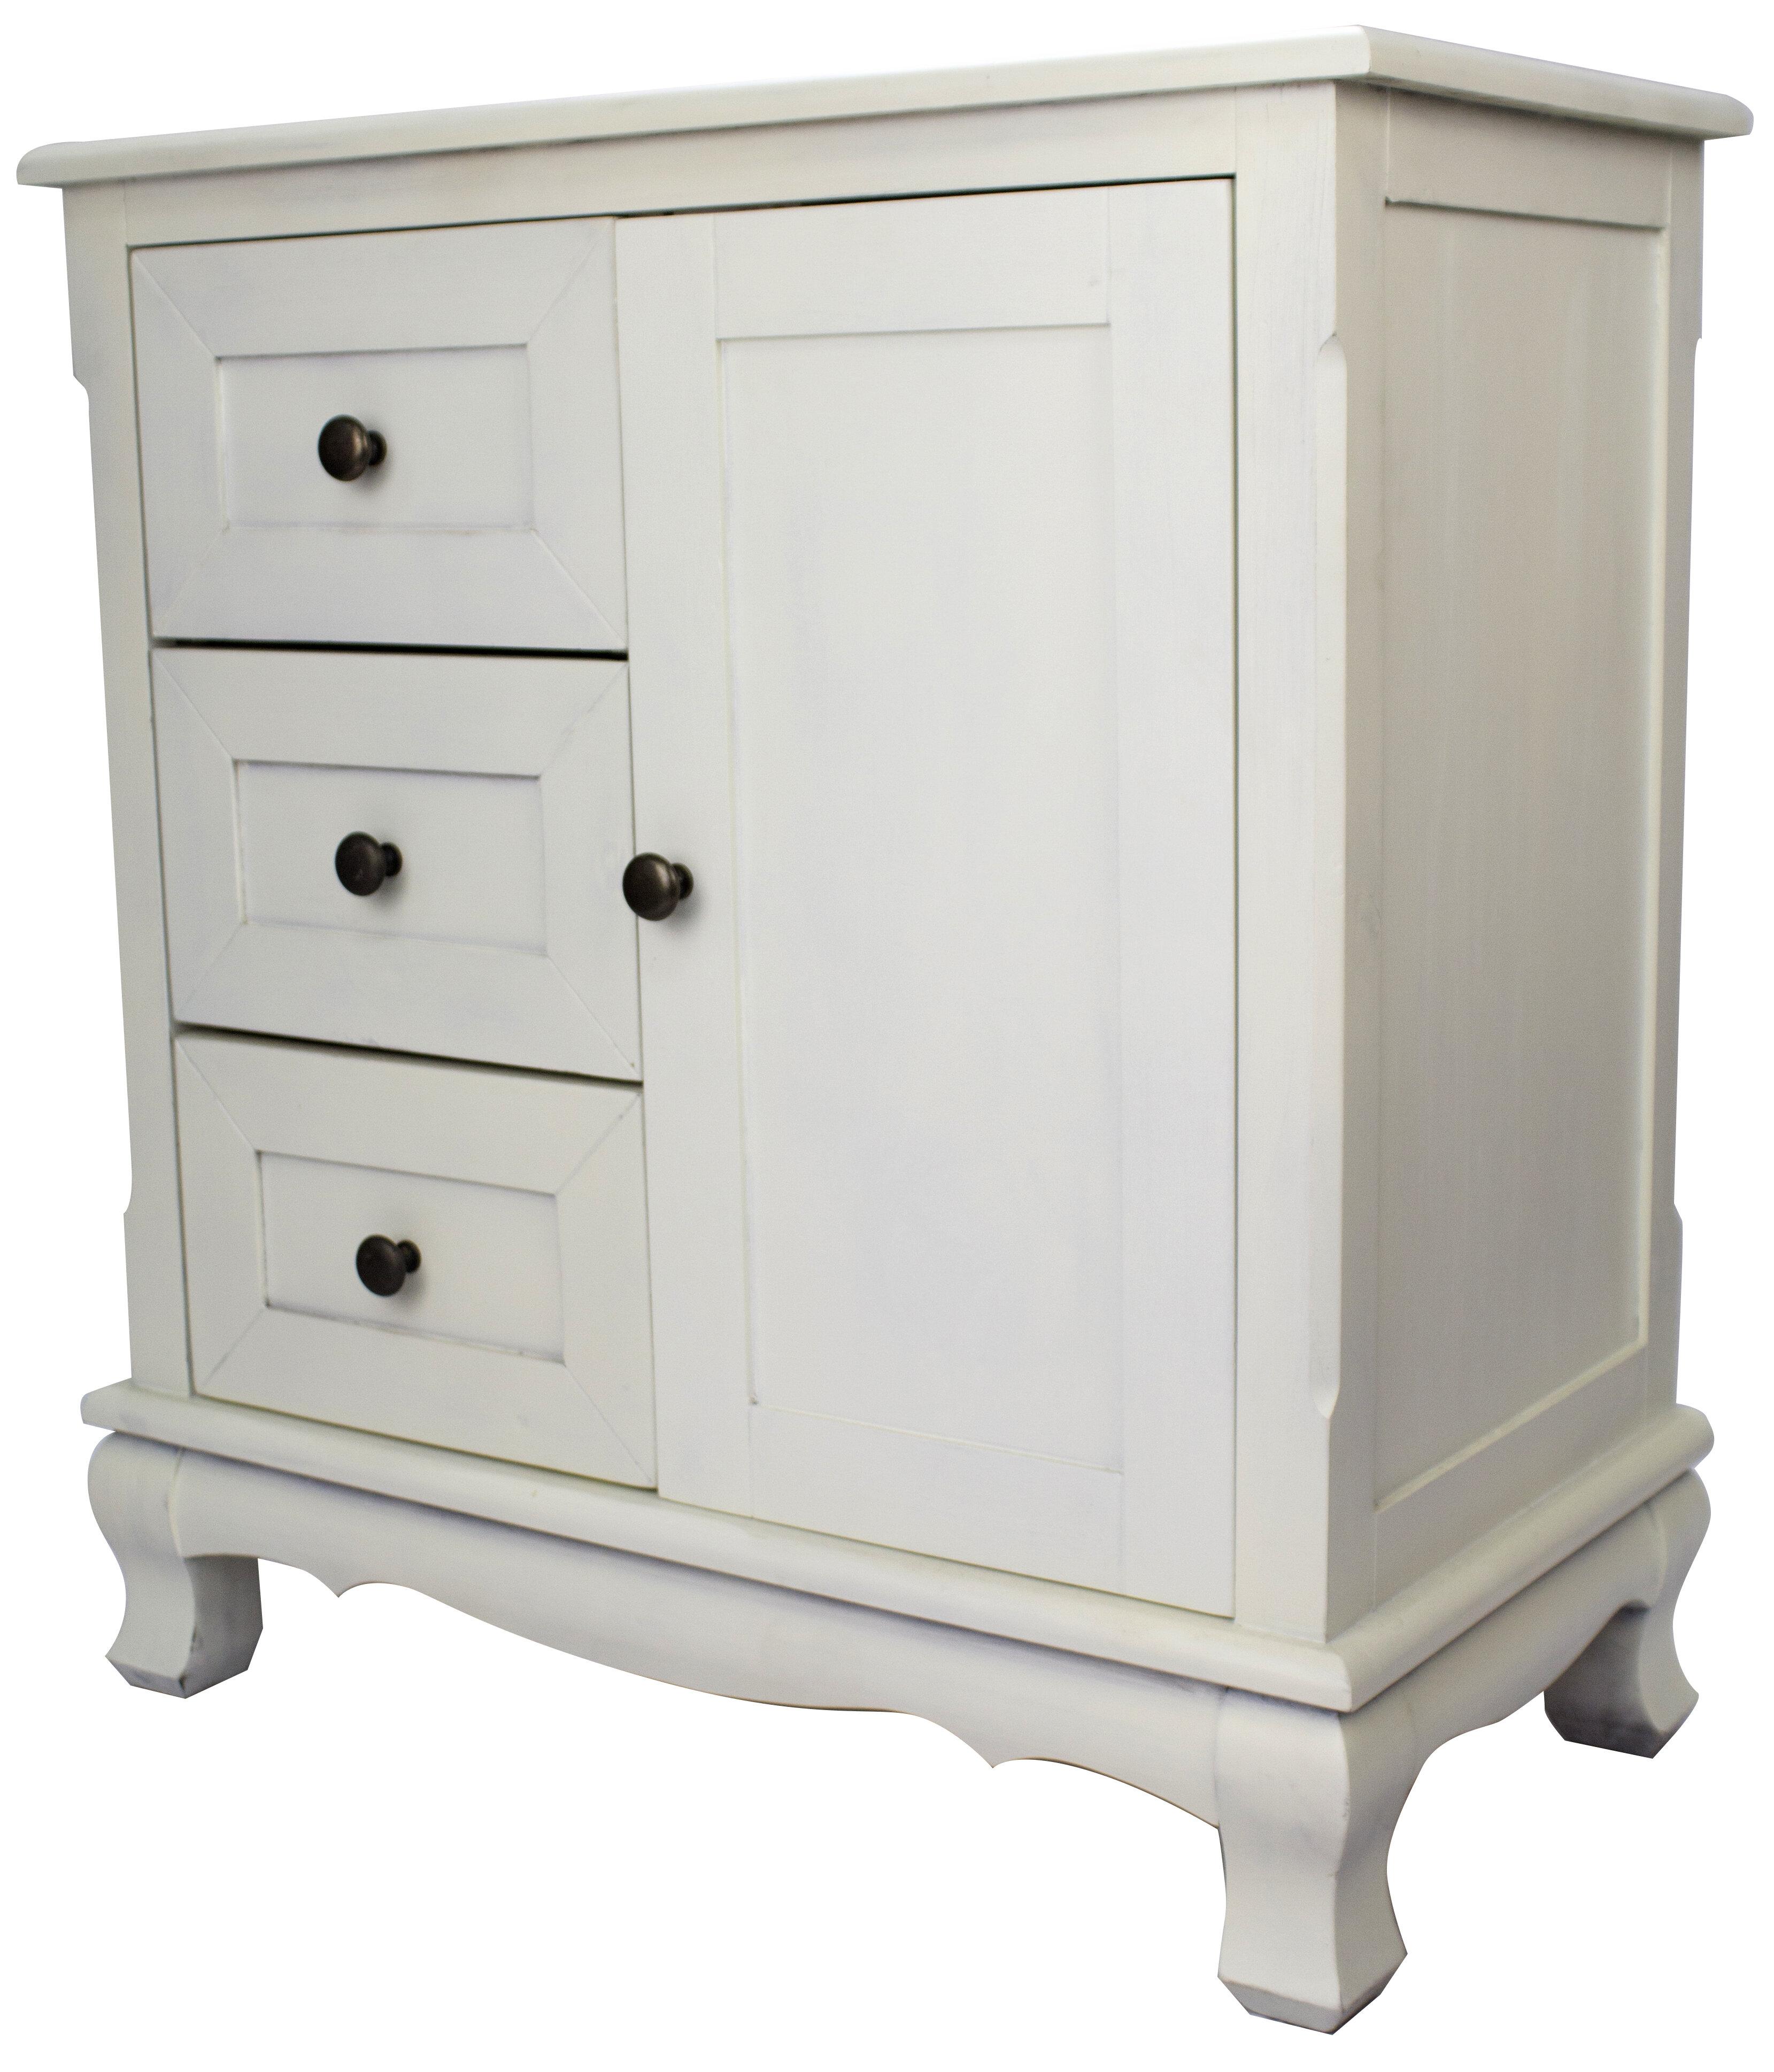 Heather Ann 3 Drawer And 1 Door Accent Cabinet U0026 Reviews | Wayfair